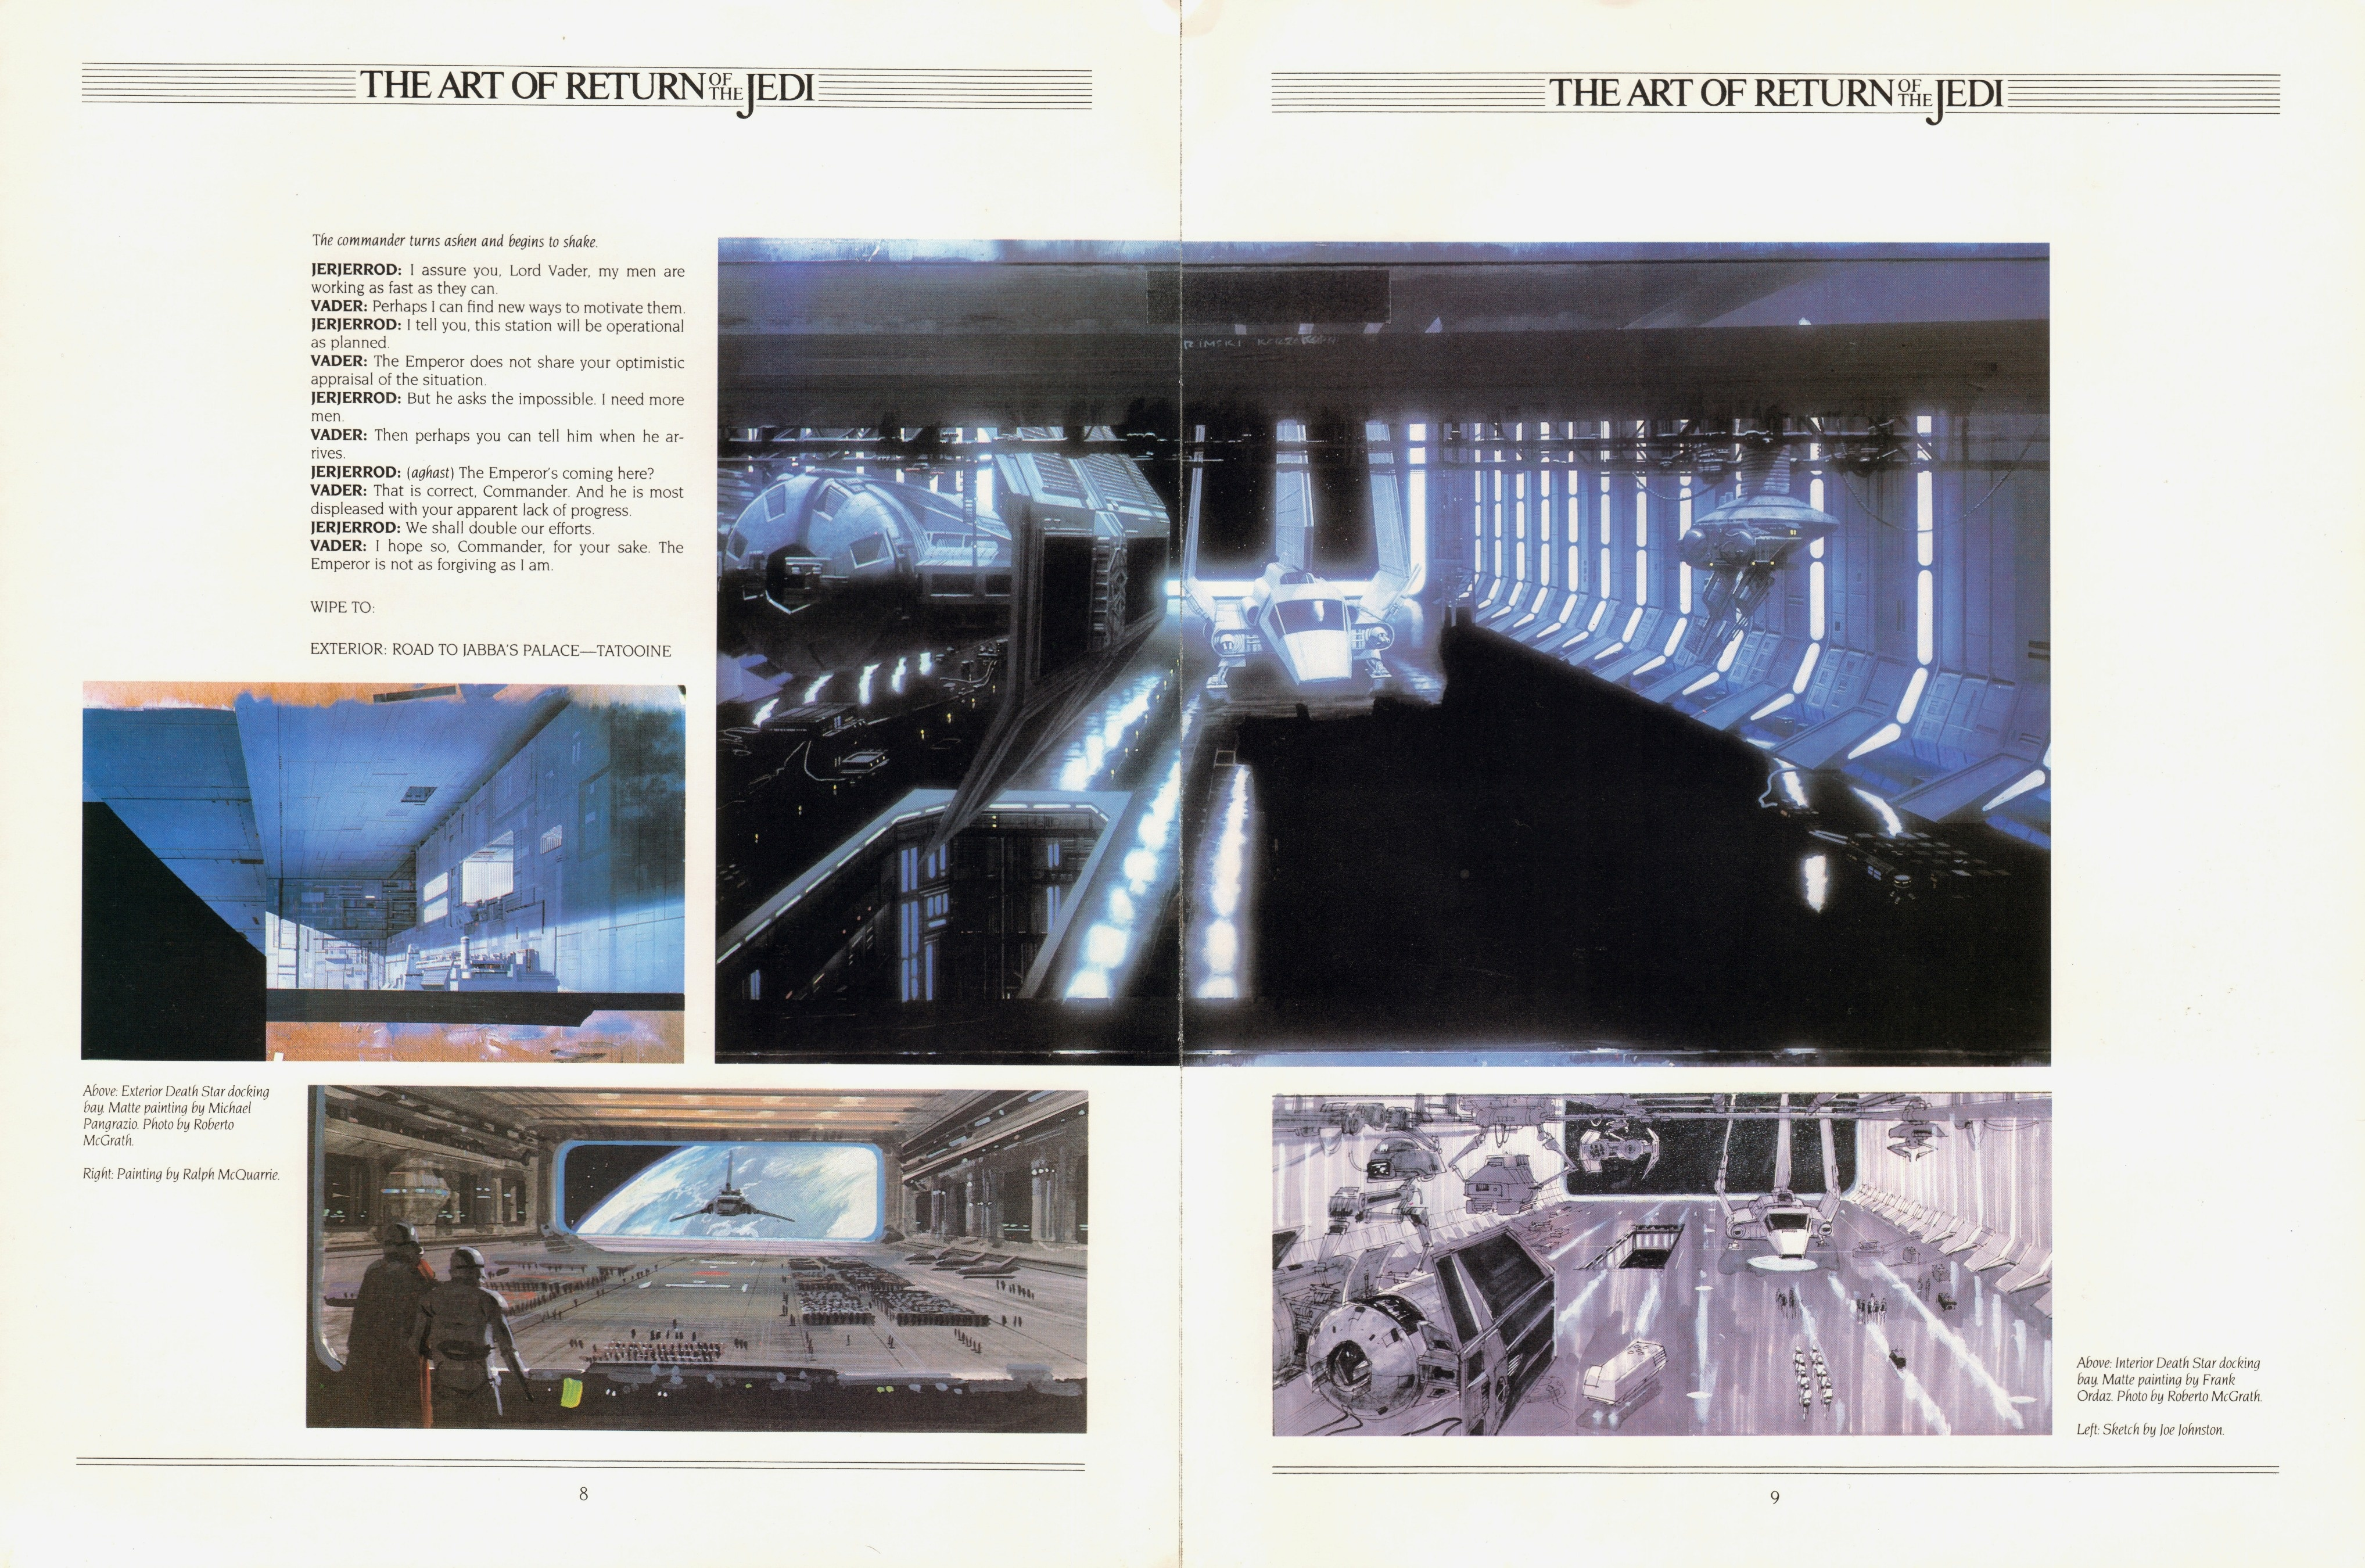 Art of Return of the Jedi (b0bafett_Empire)-p008-009